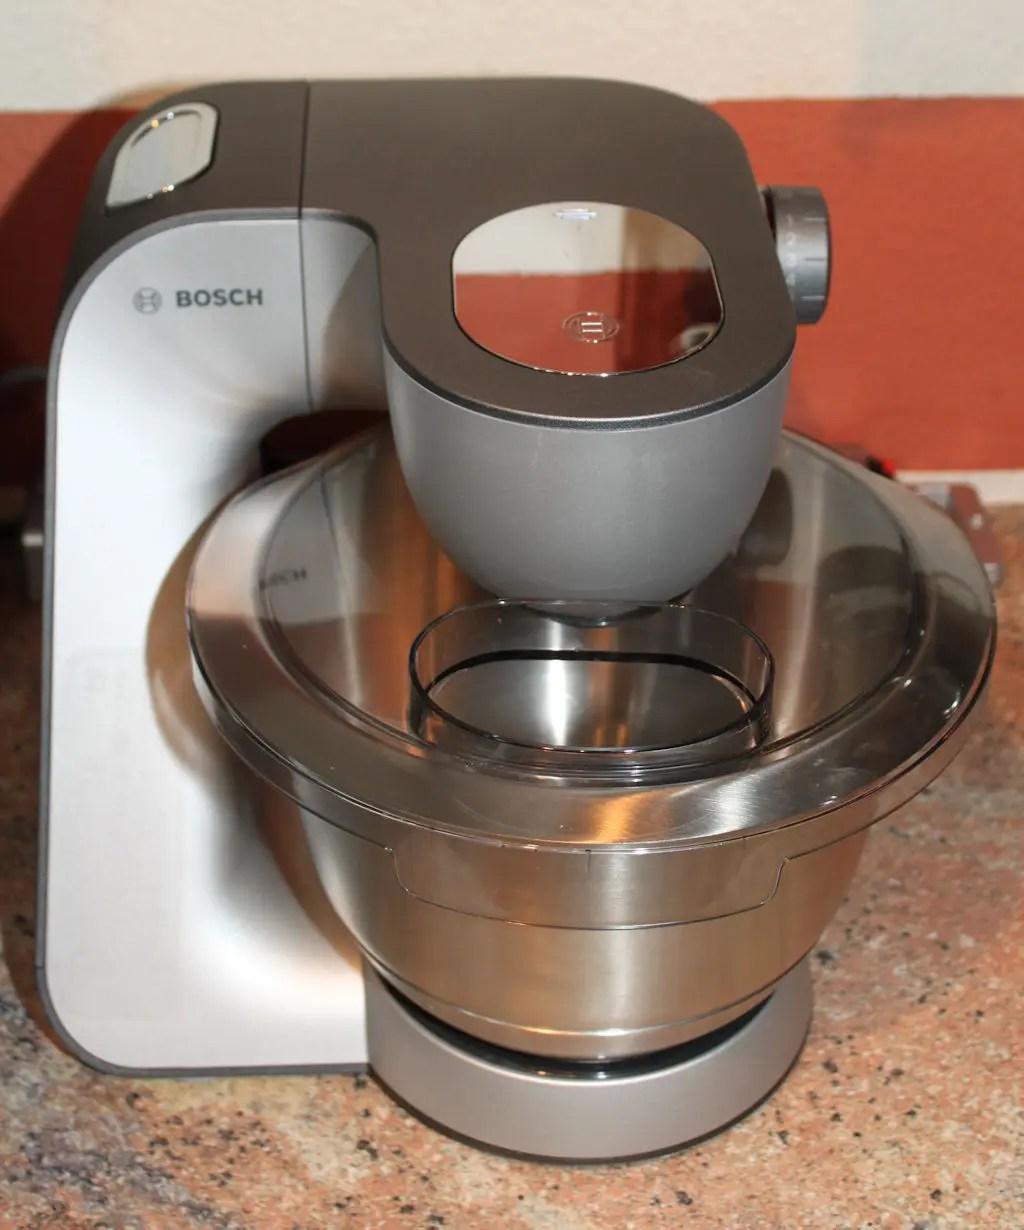 ProductReview Bosch MUM5 Kchenmaschine  Futterattackede